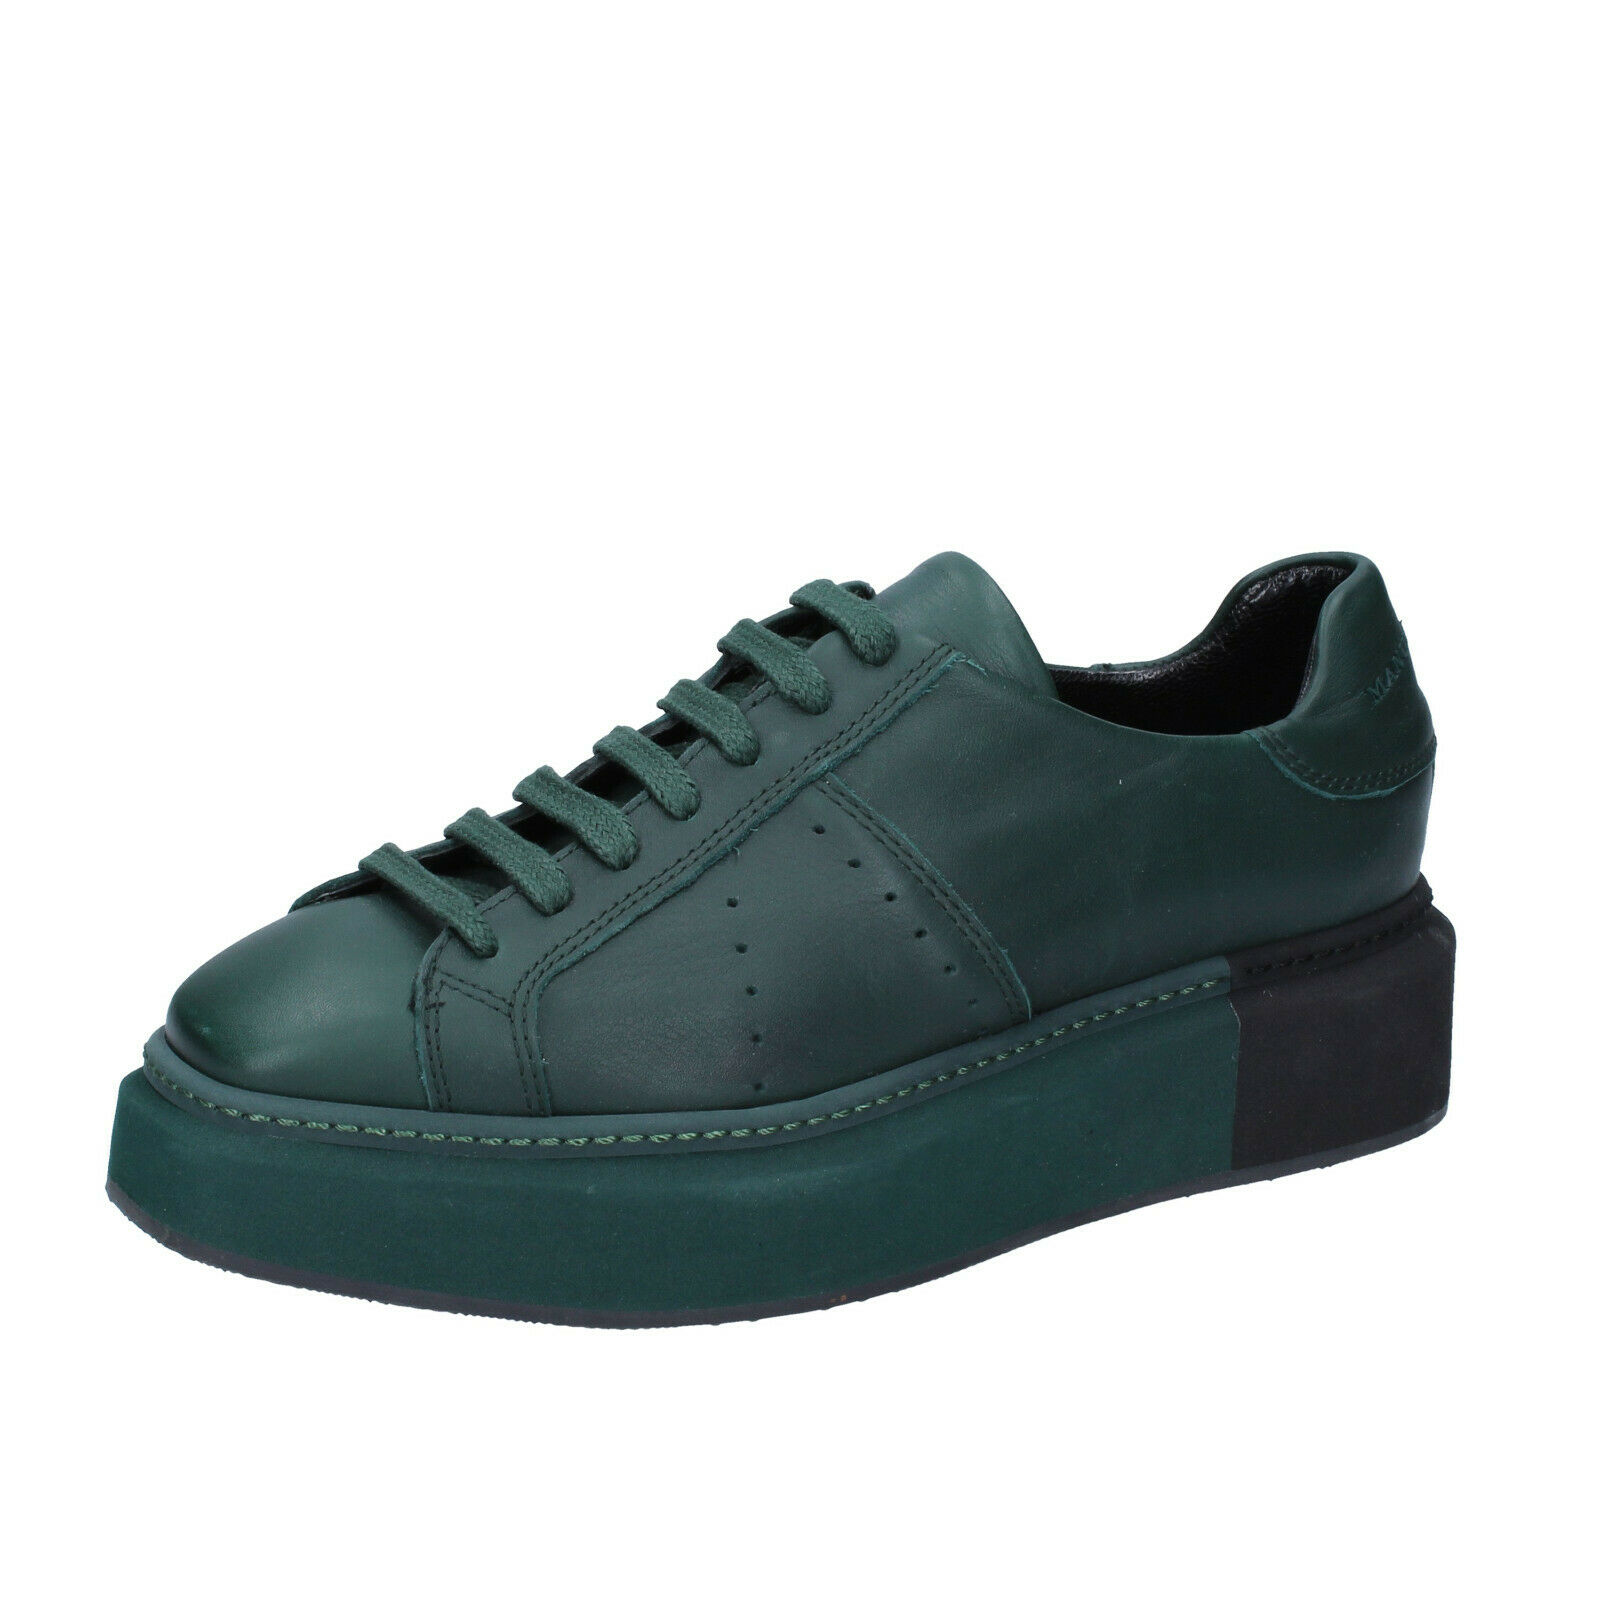 Skor för kvinnor  MANUEL BARCELO 7 7 7 (EU 37) gympaskor  grönt läder BS329 -37  unik design